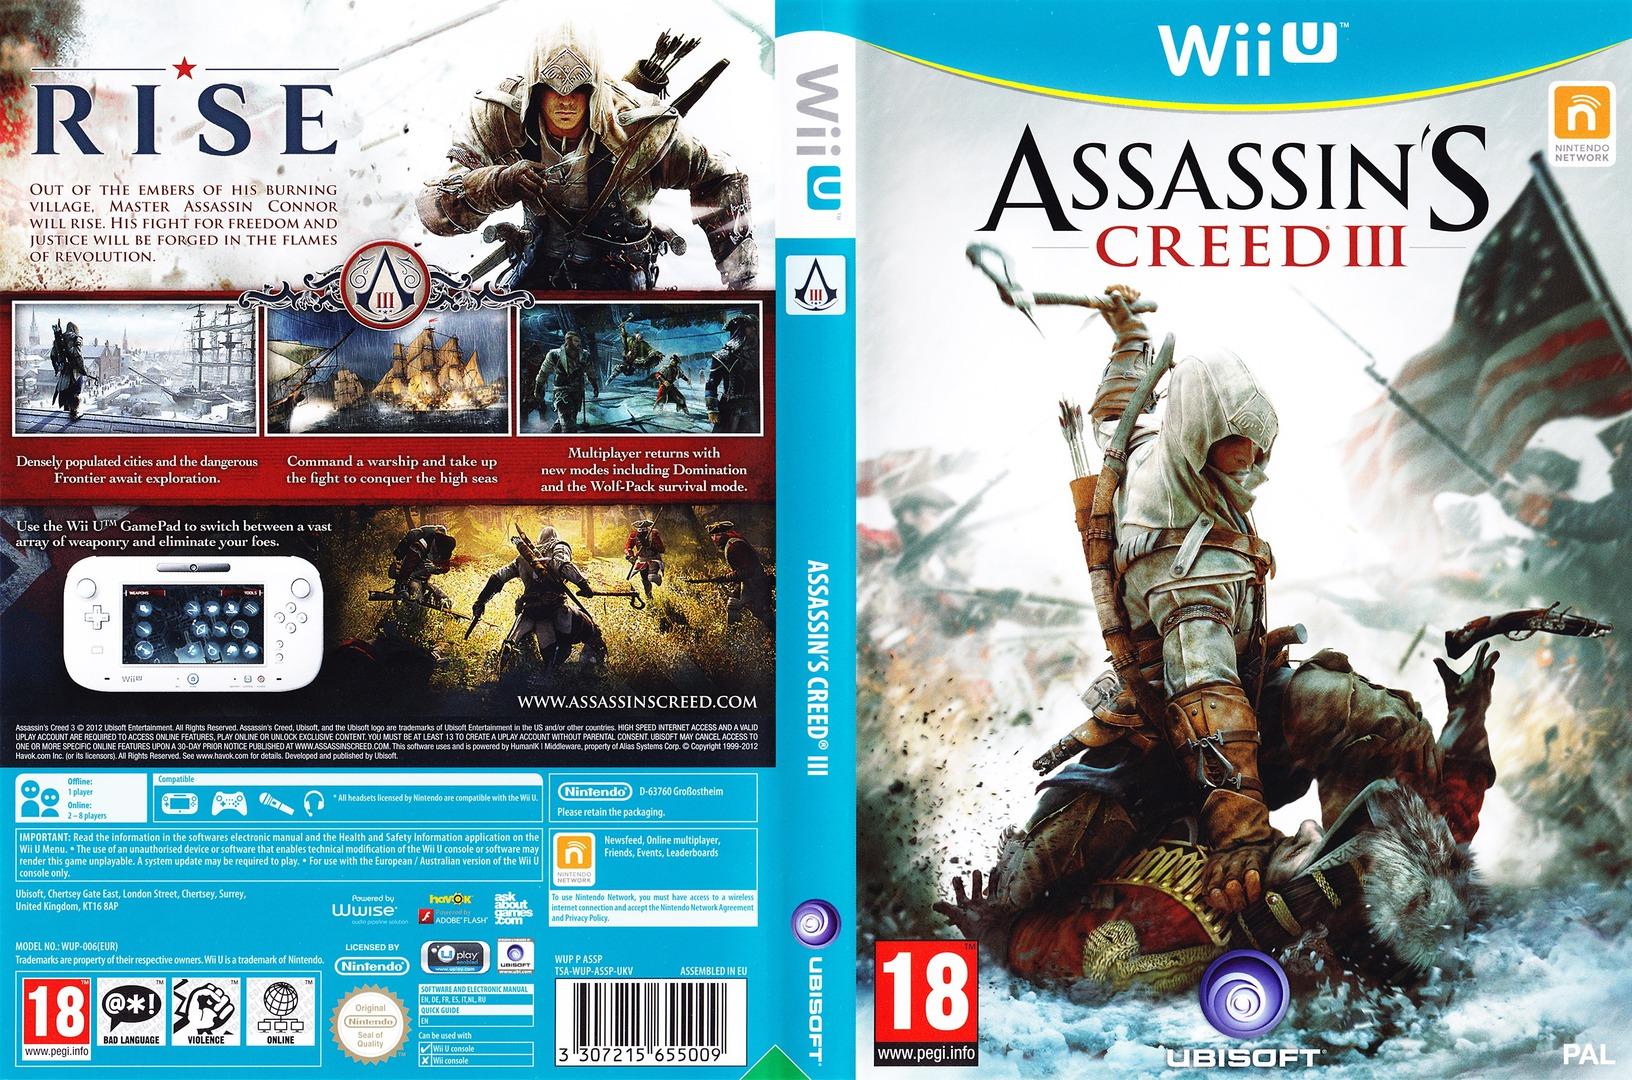 Assassin's Creed III WiiU coverfullHQ (ASSP41)